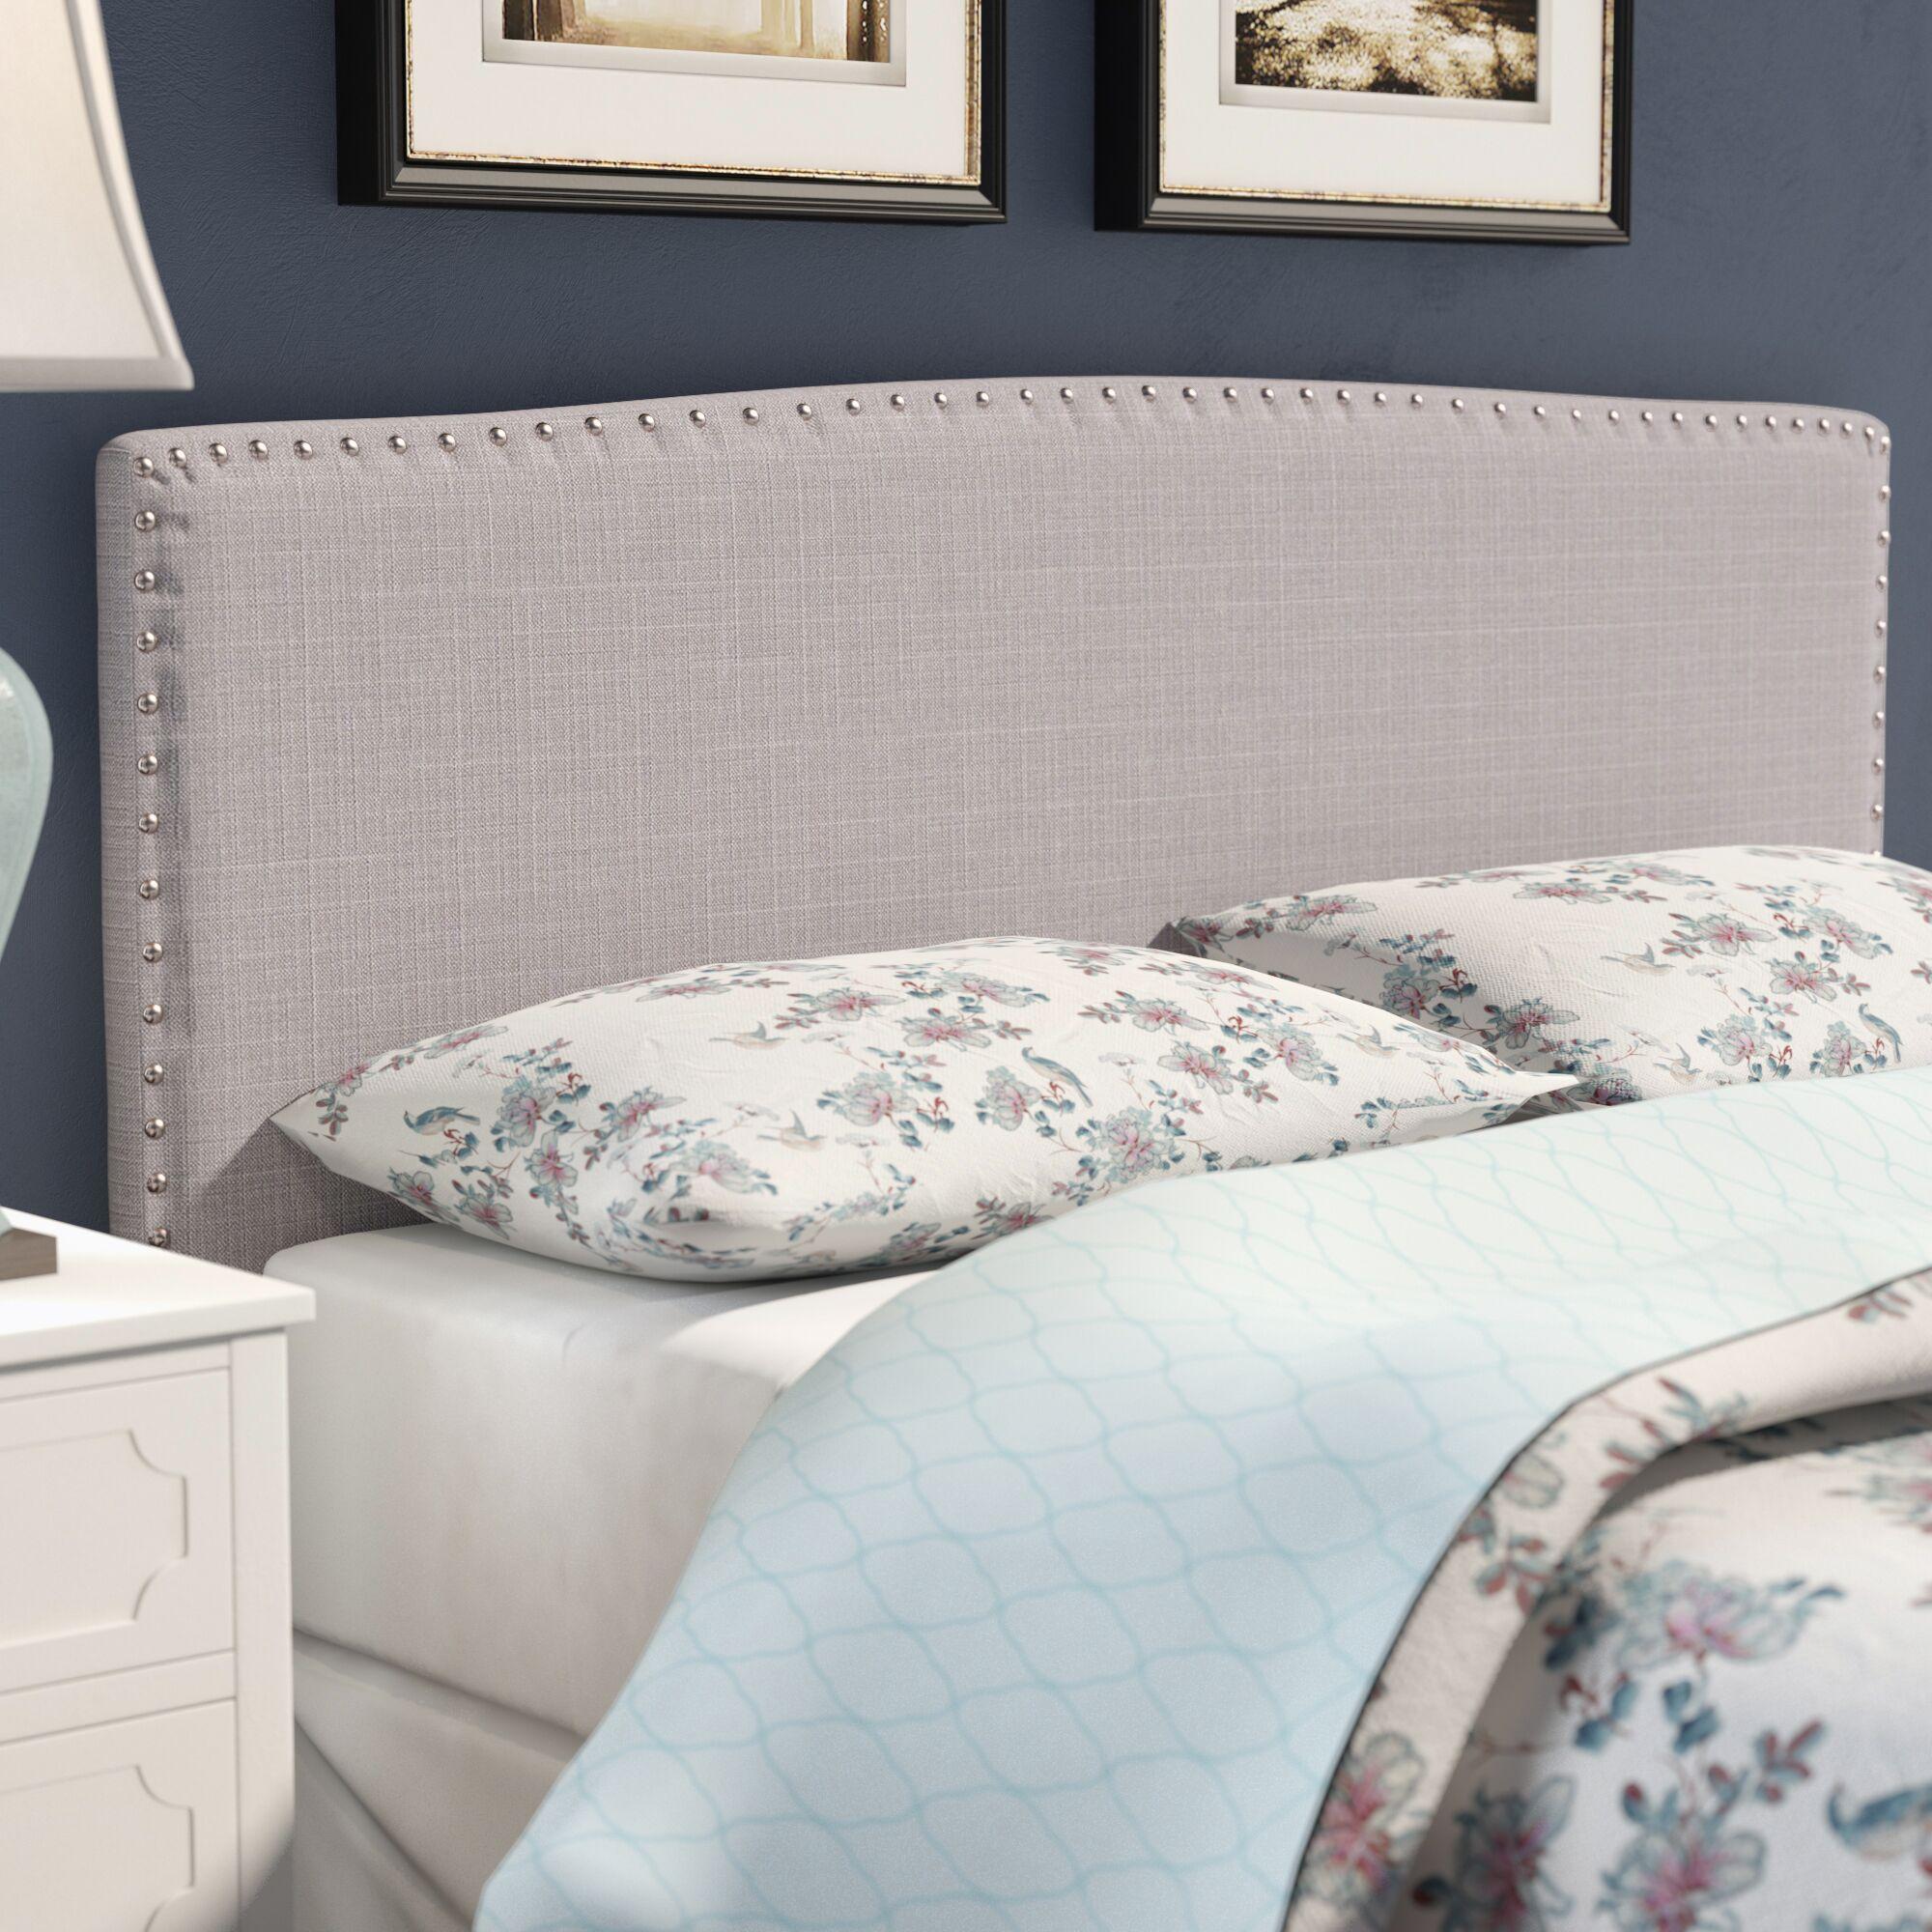 Harmonsburg Upholstered Panel Headboard Size: Full / Queen, Upholstery: Taupe